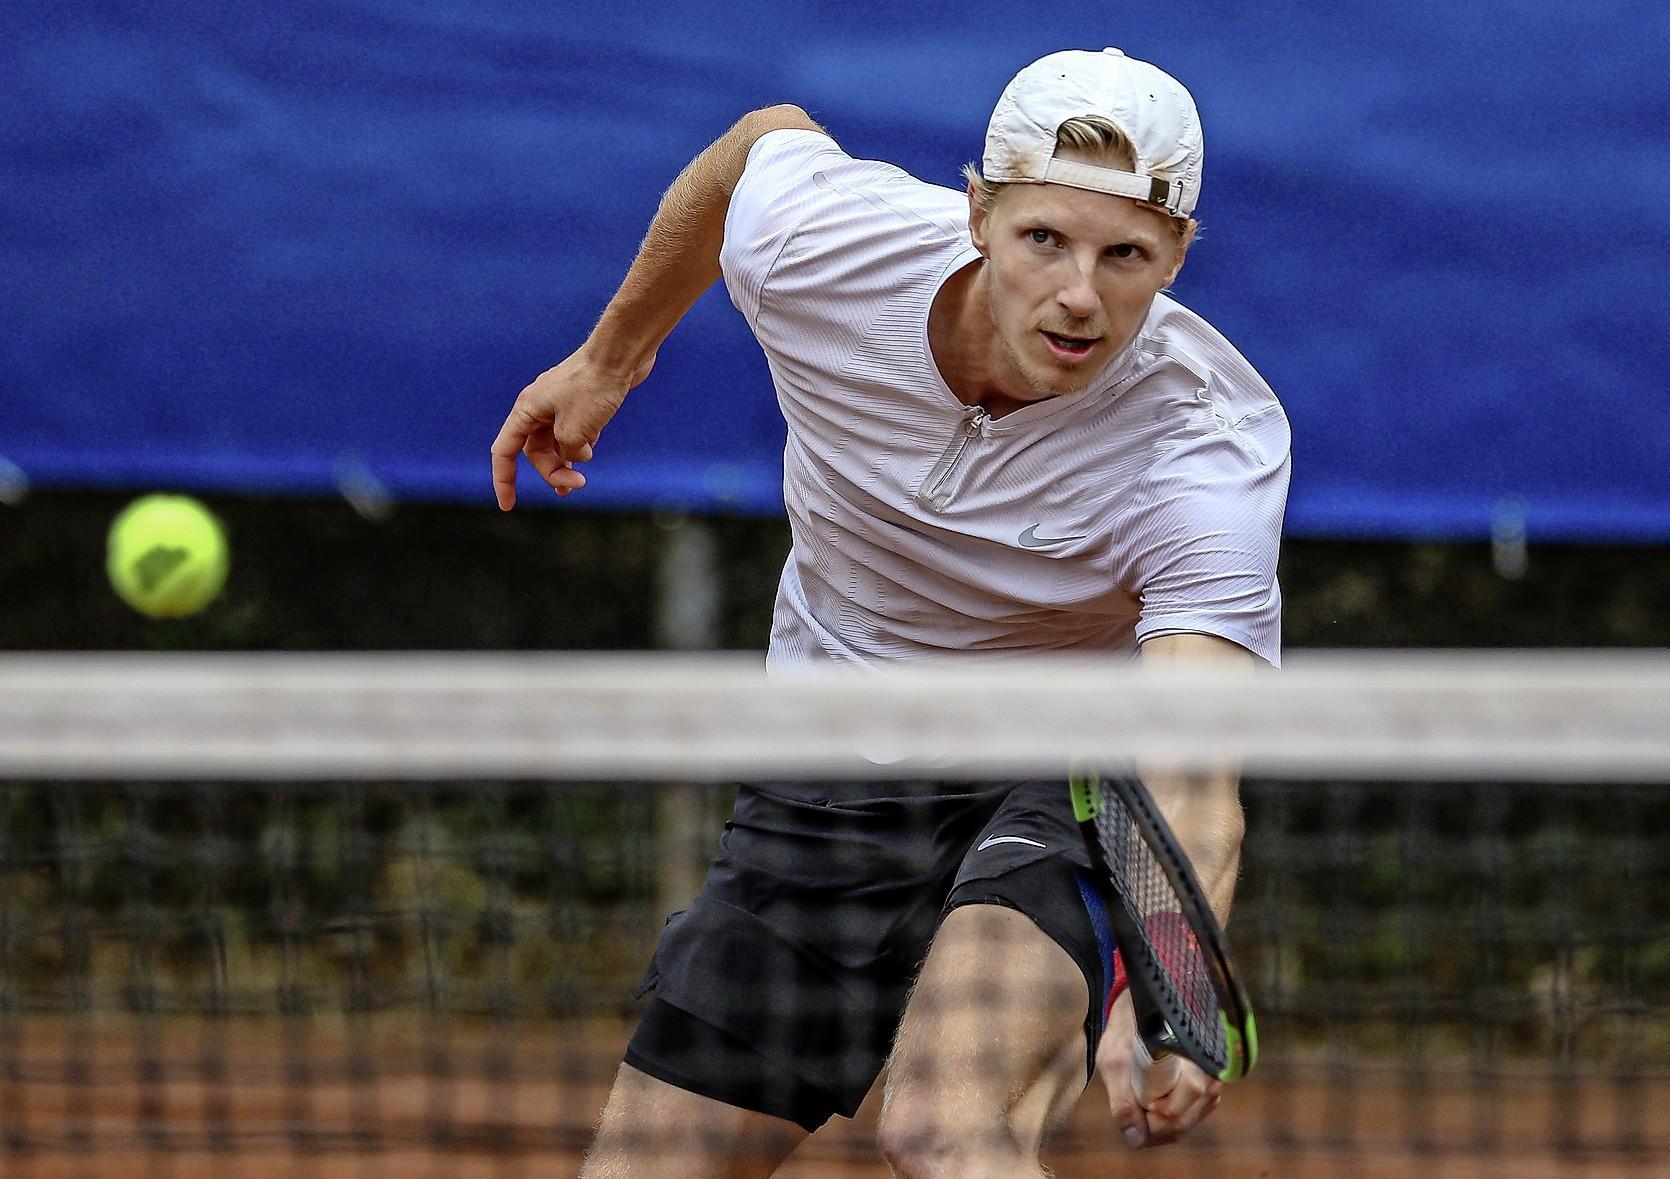 Venhuizer Gijs Brouwer (24) wint ITF-tennistoernooi in Egypte